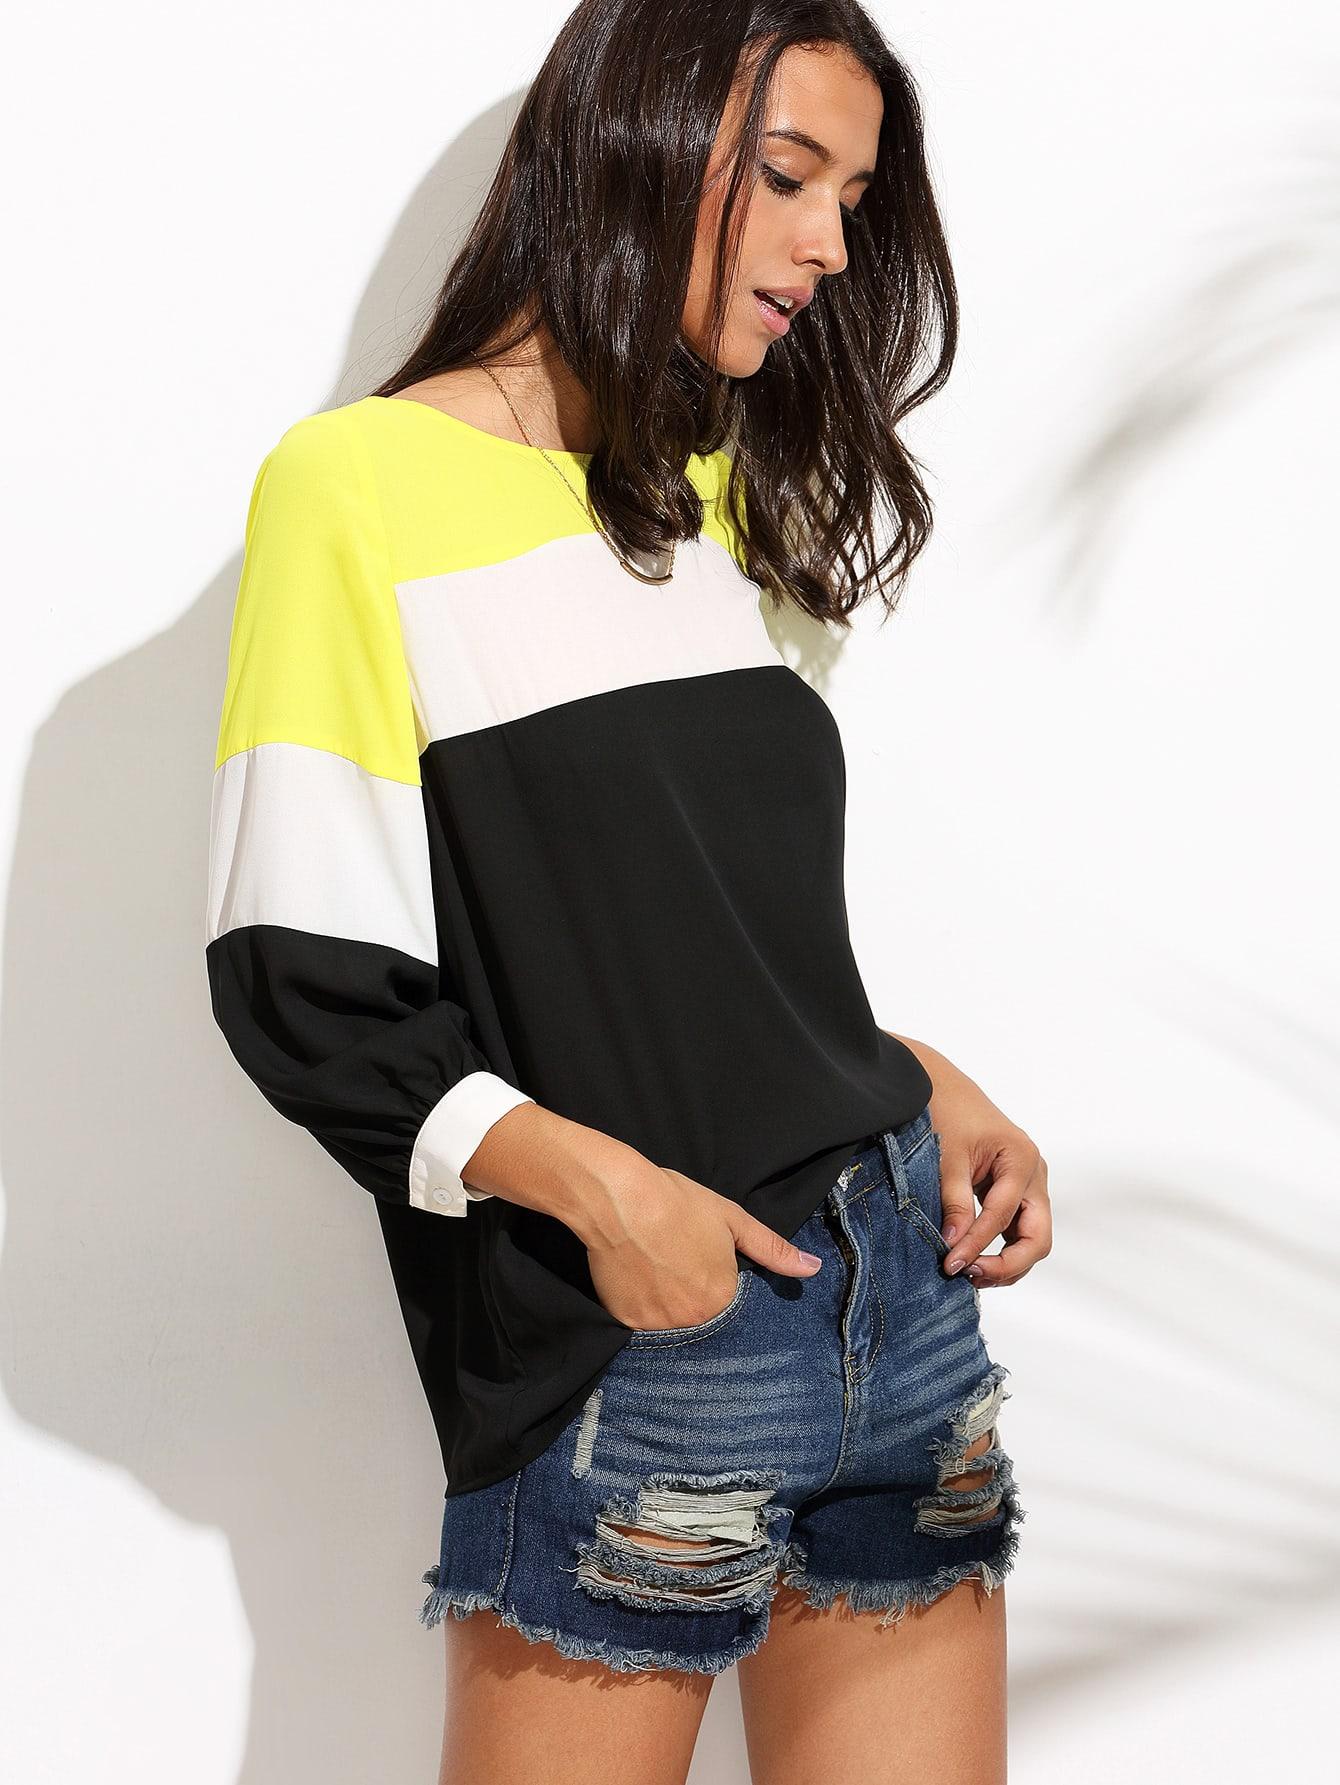 blouse160726712_4